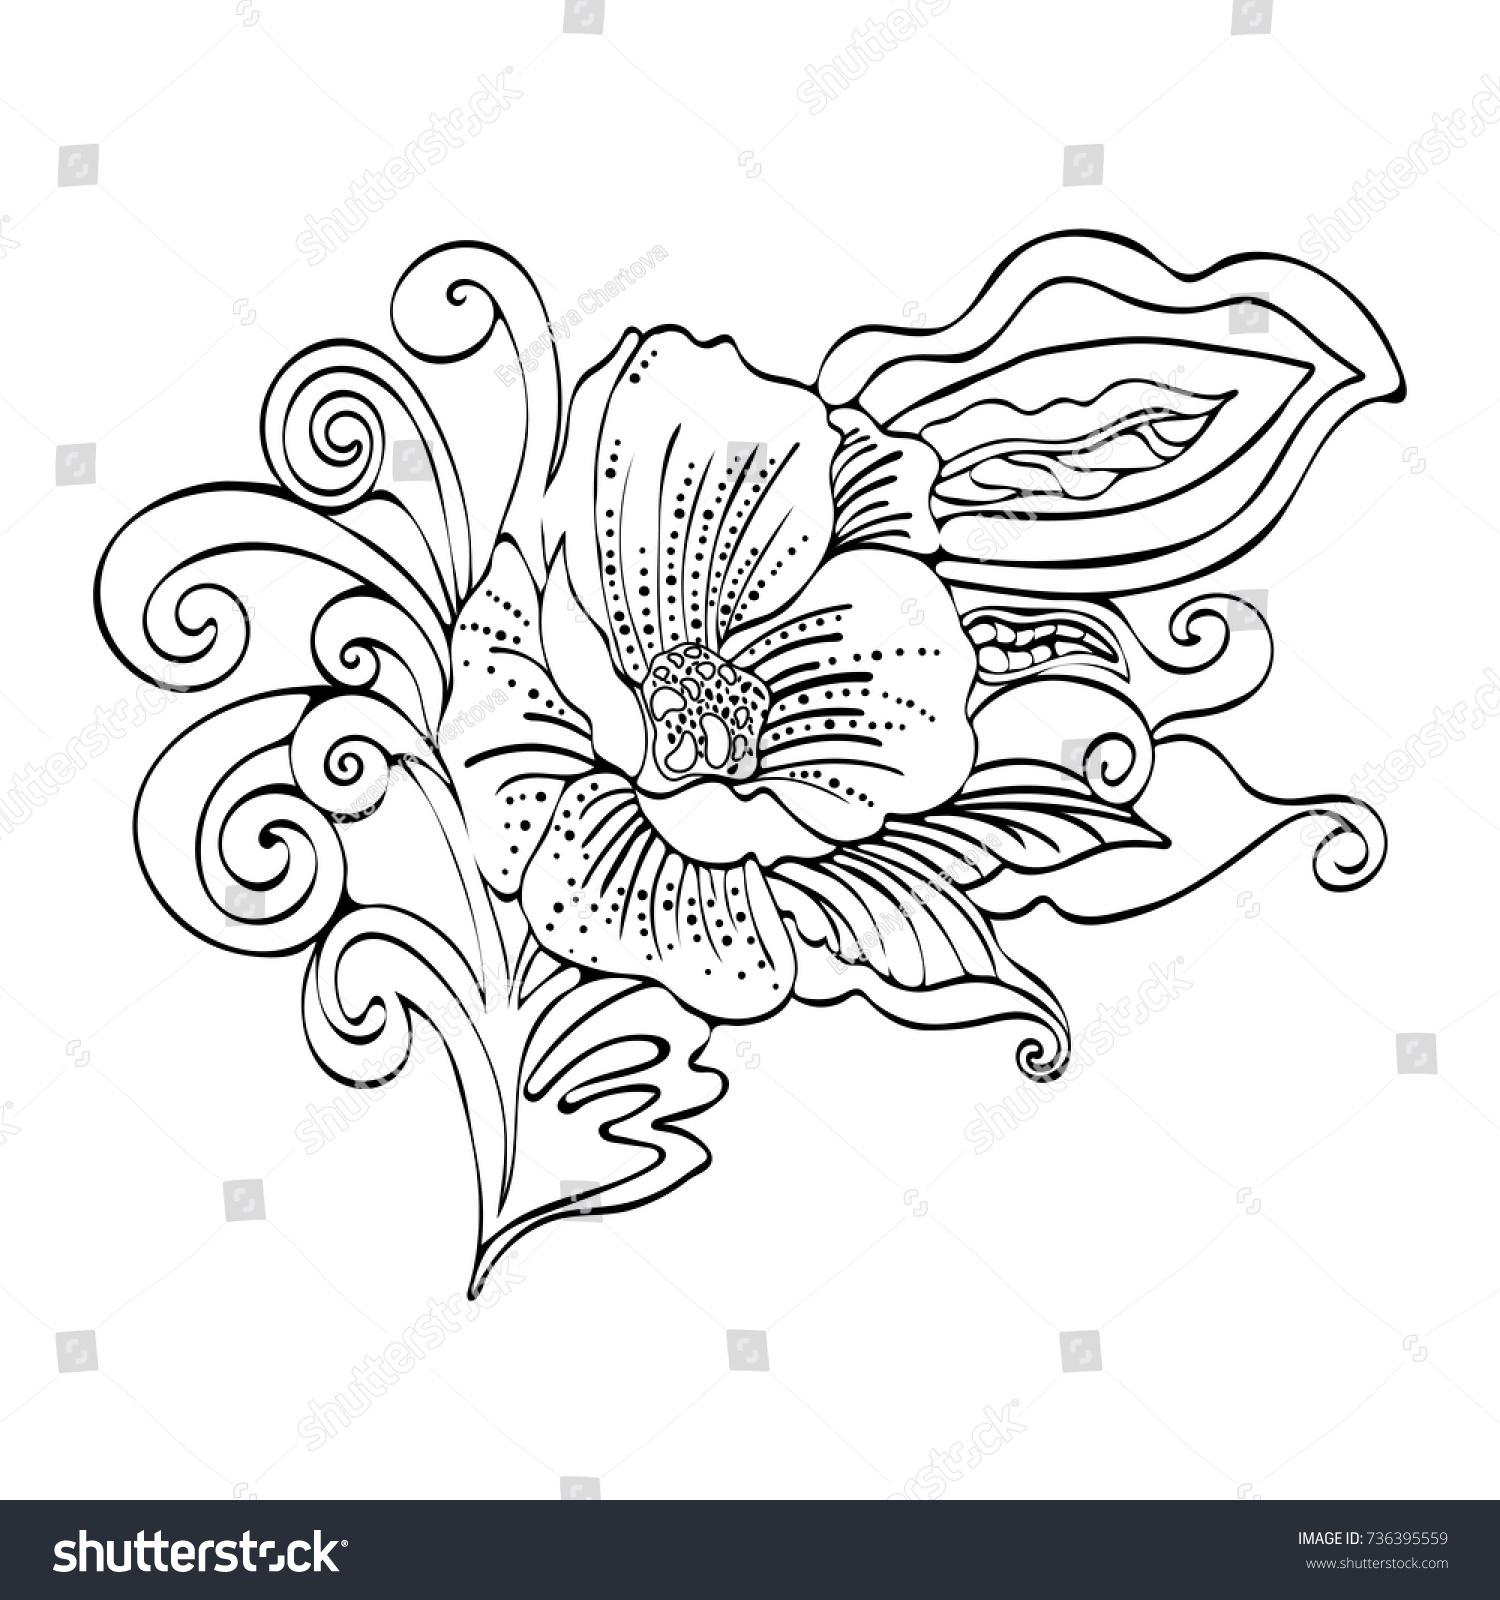 Abstract Flower Cartoon Vector Black White Stock Vector Royalty